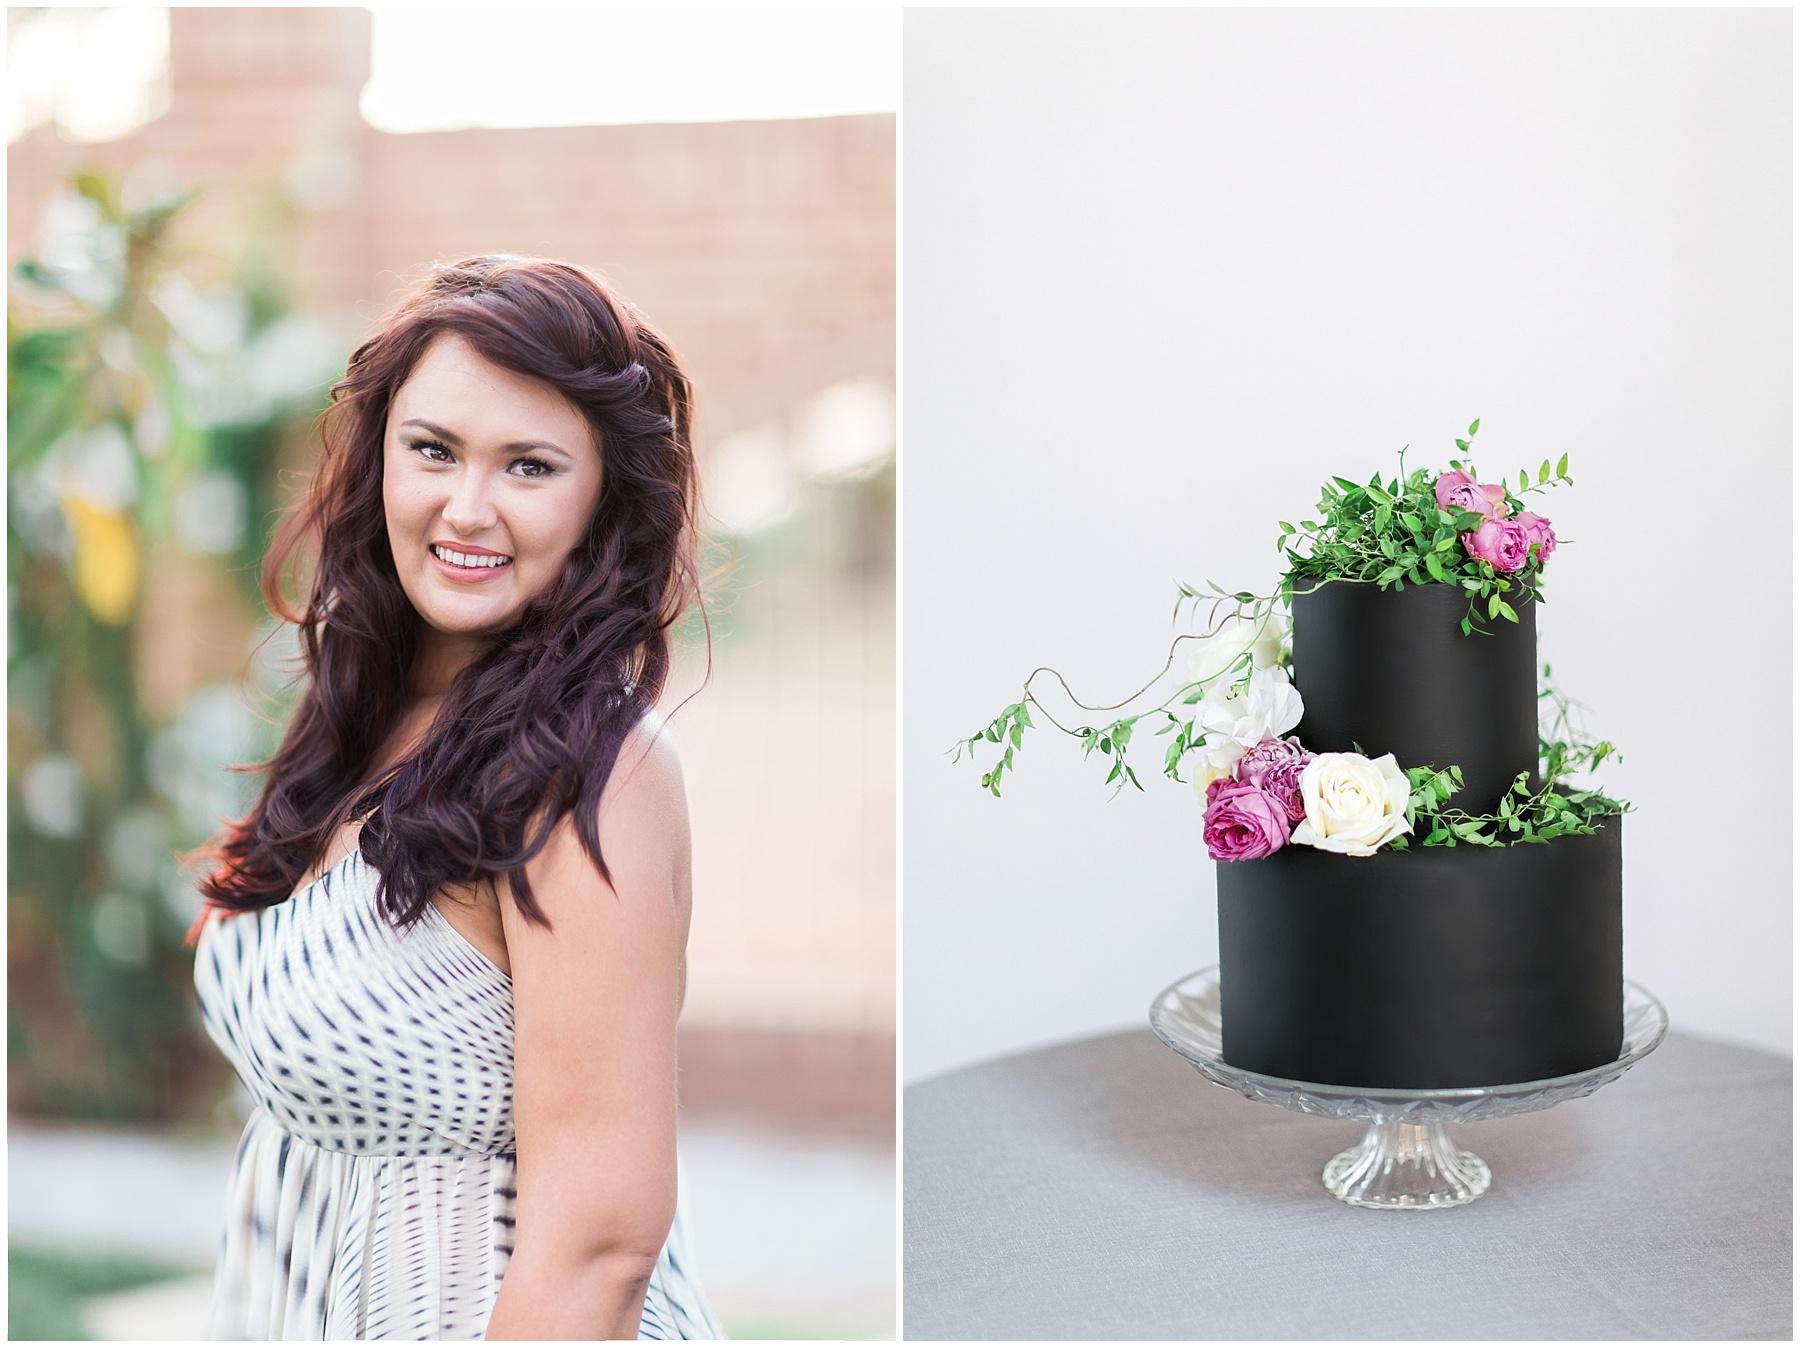 AliciaLandman_JoleneandZander_Wedding_The Pretty Blog_0400.jpg